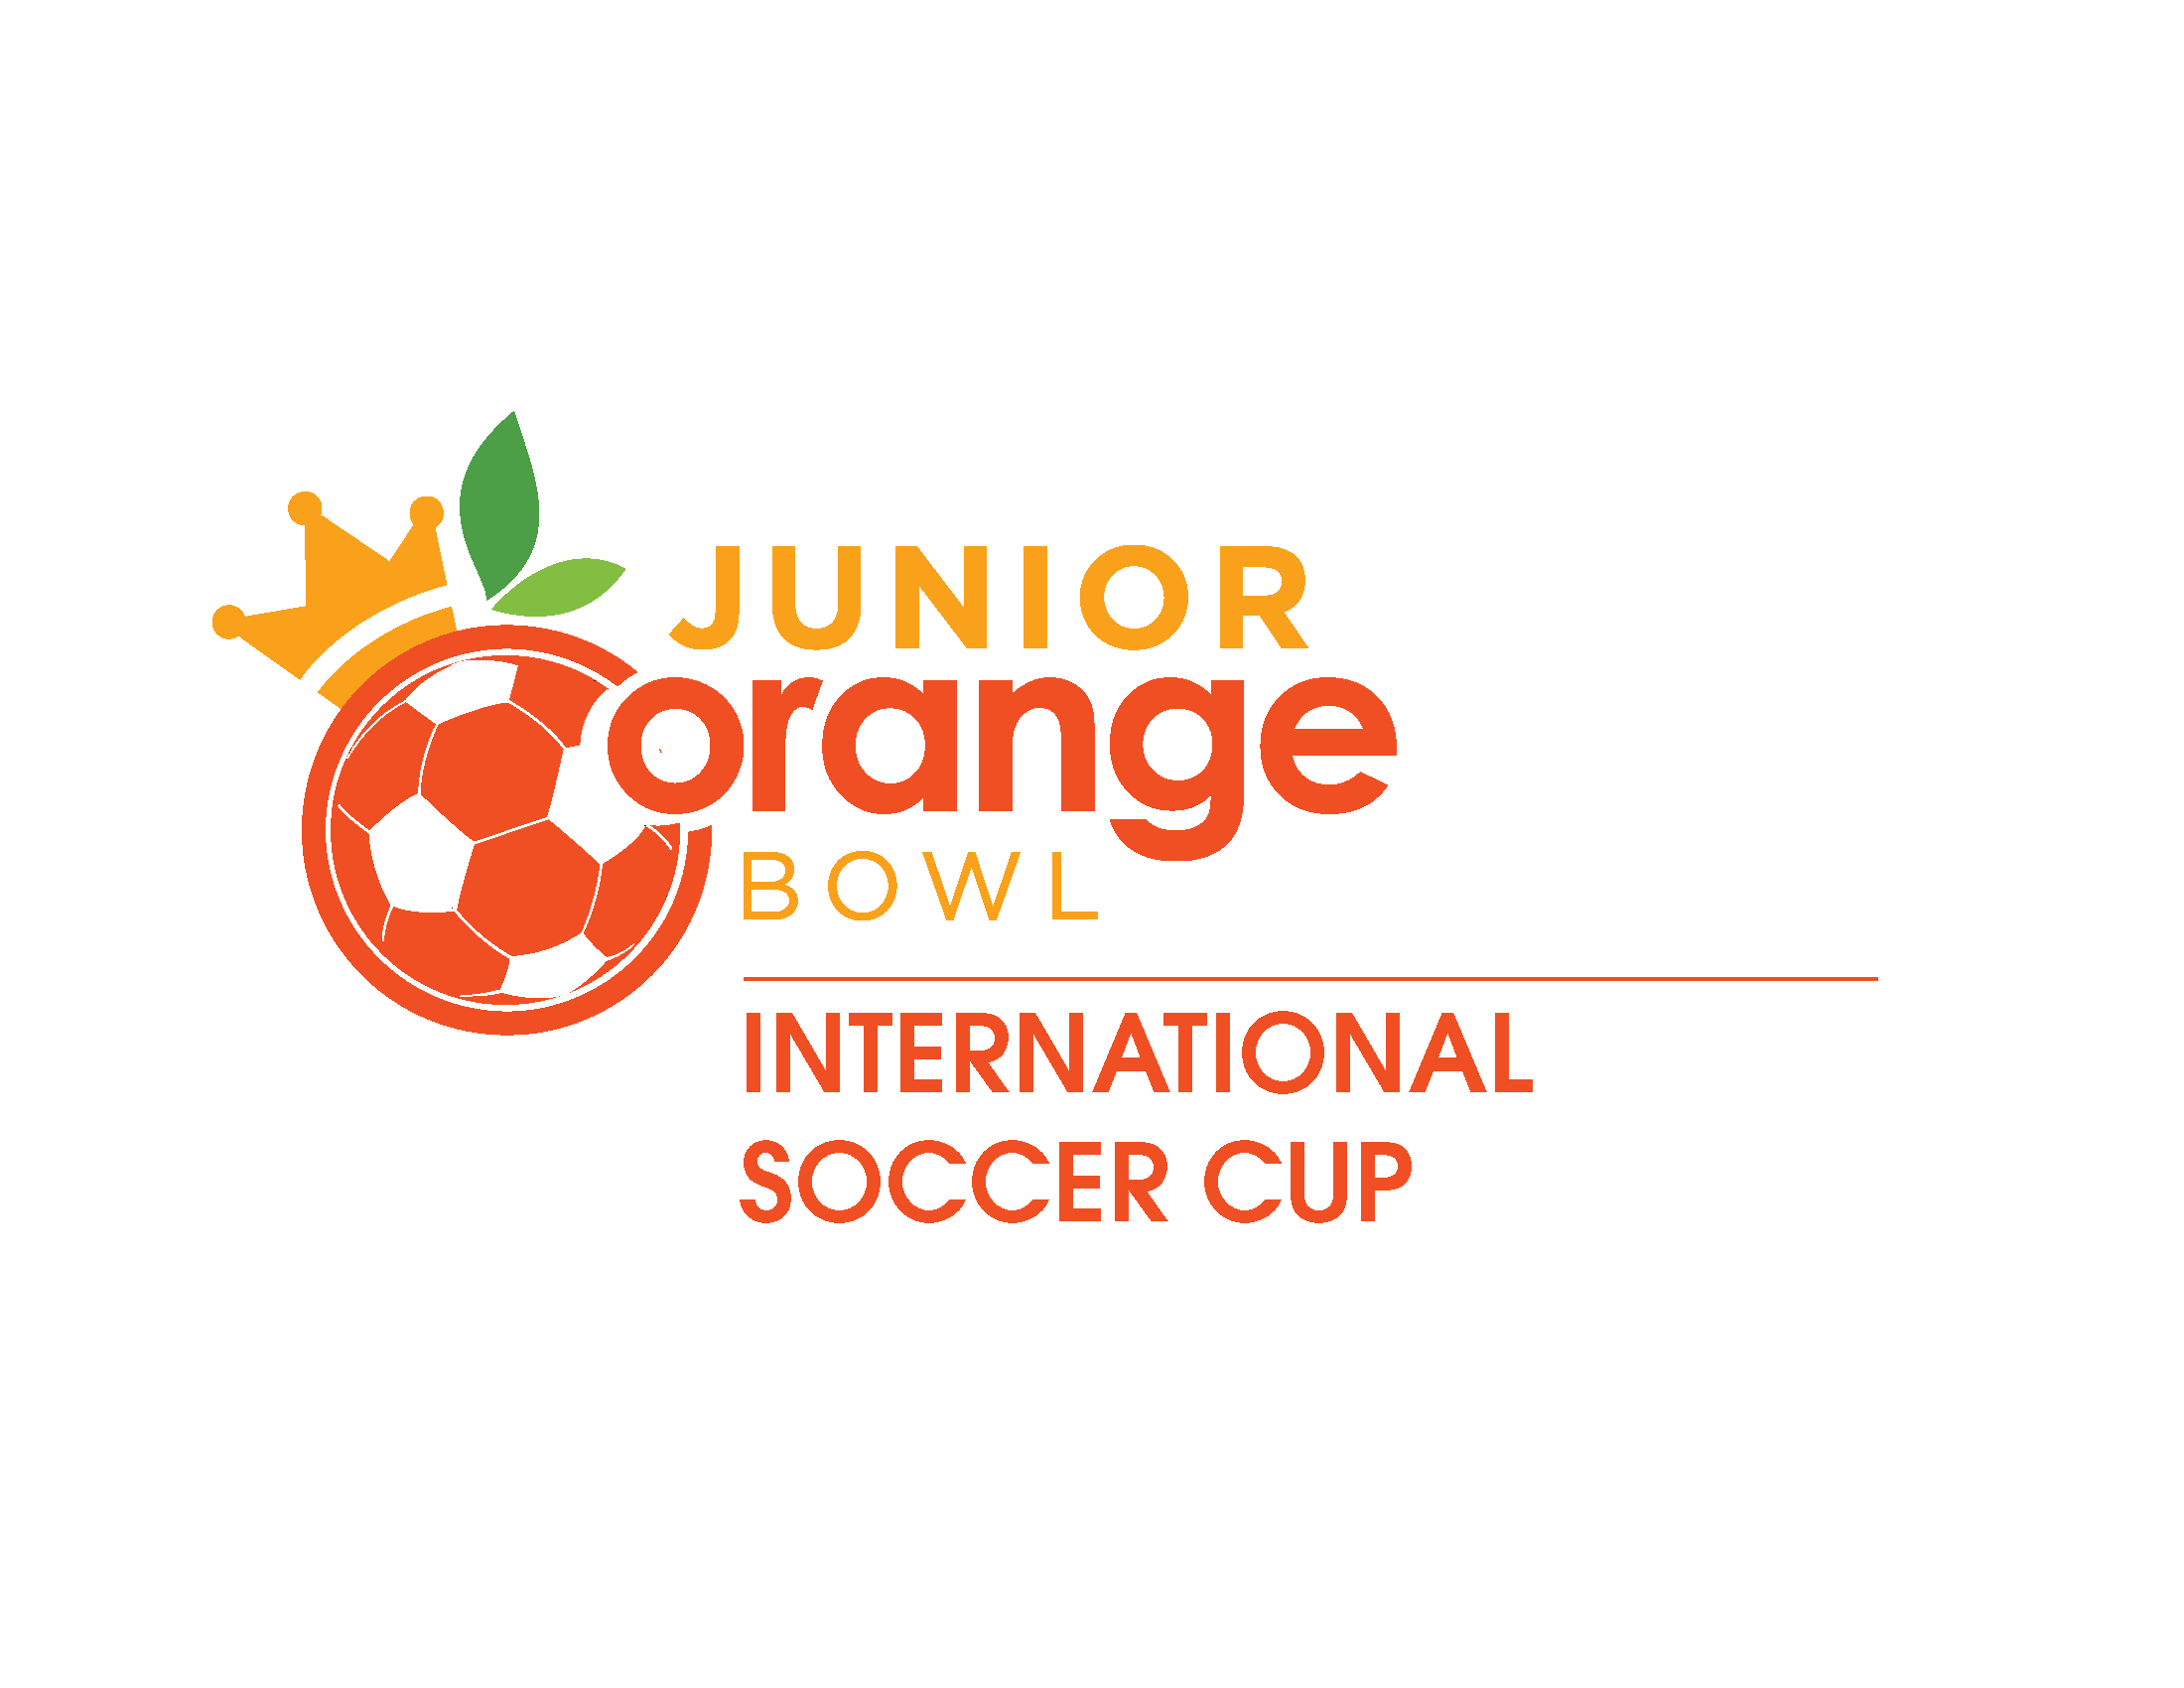 Junior Orange Bowl International Soccer Cup